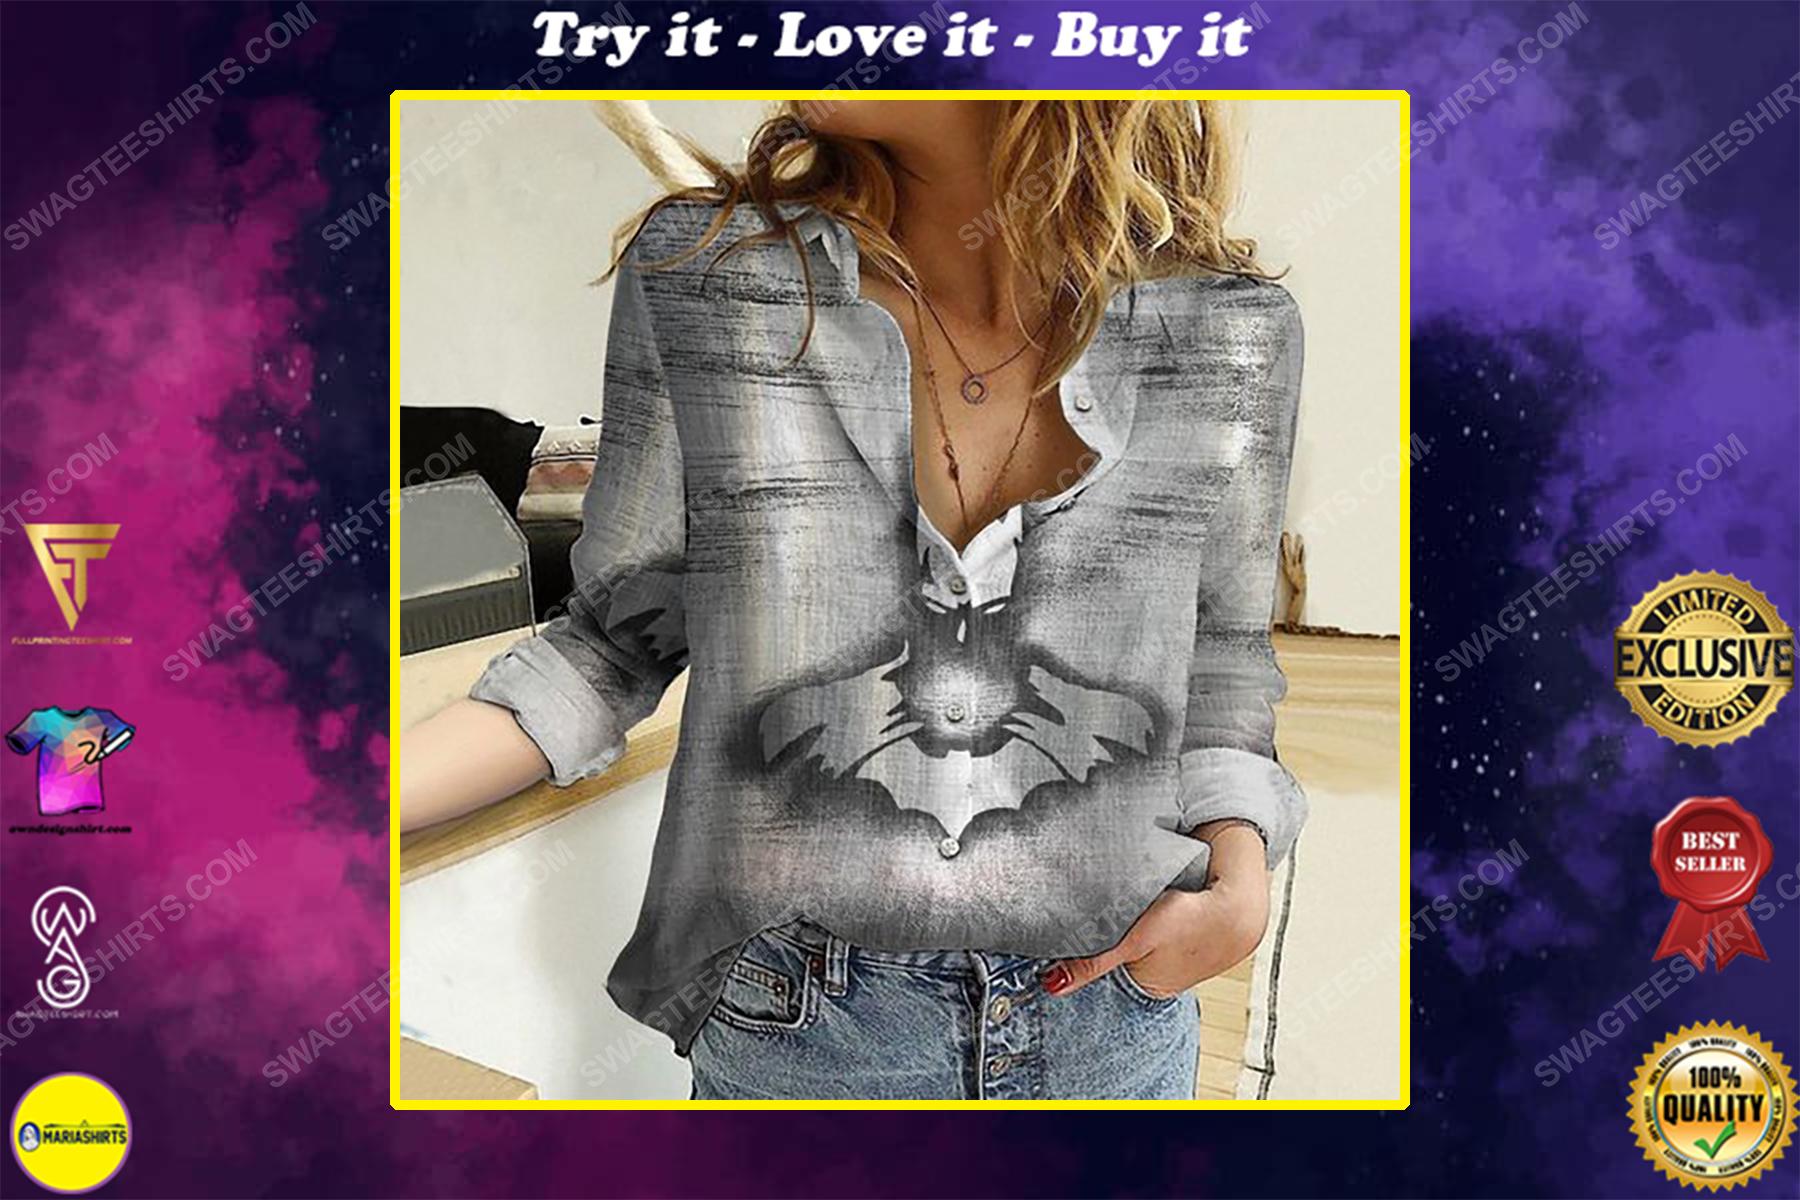 Batman metallic fully printed poly cotton casual shirt